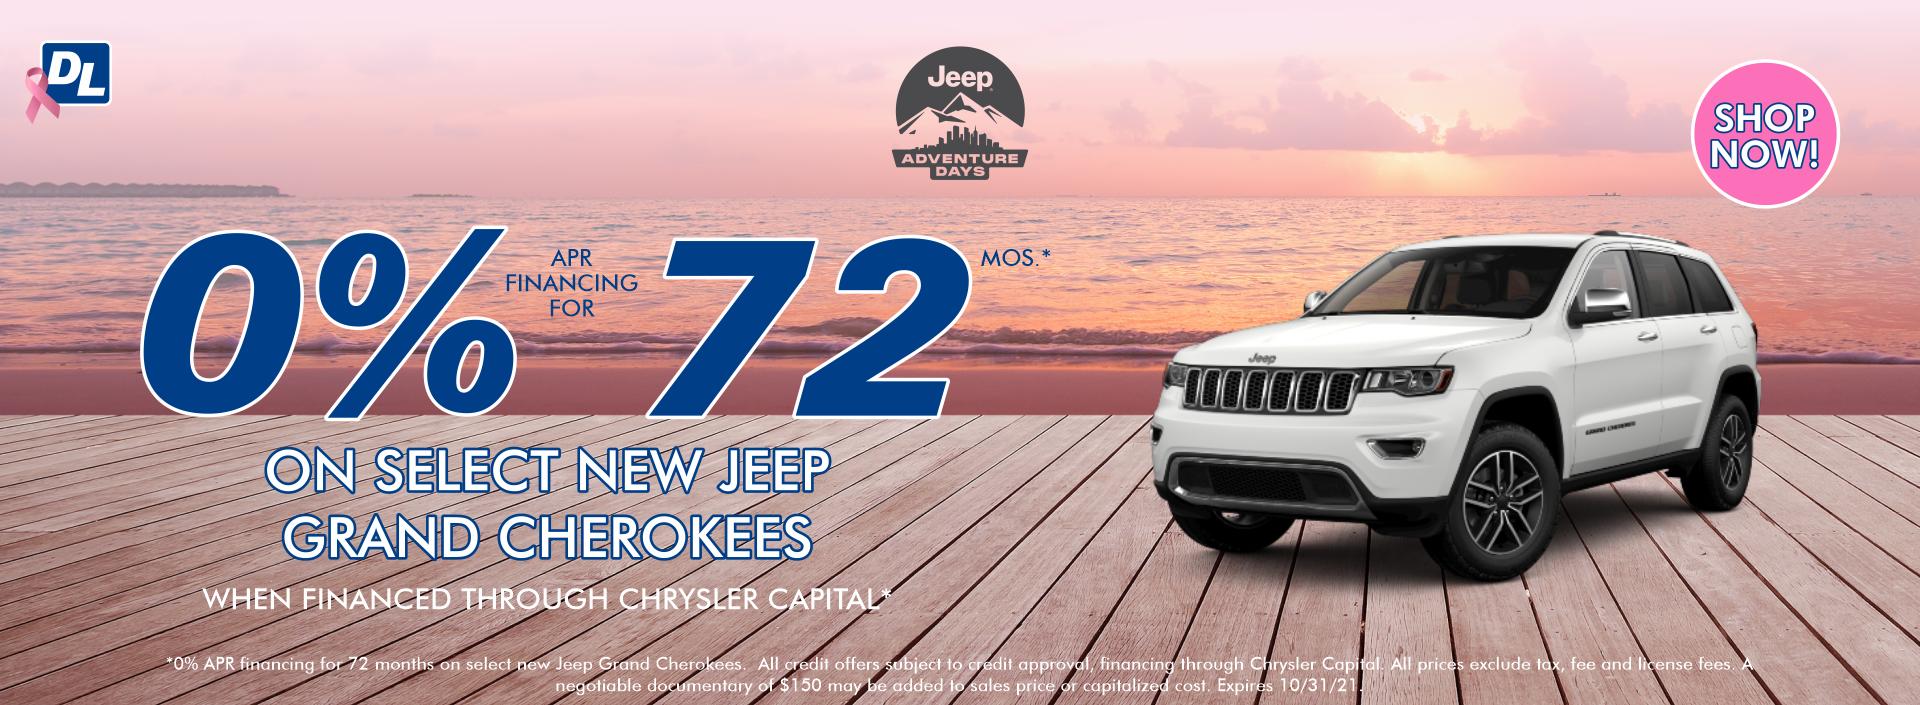 CDJR-webtiles Jeep